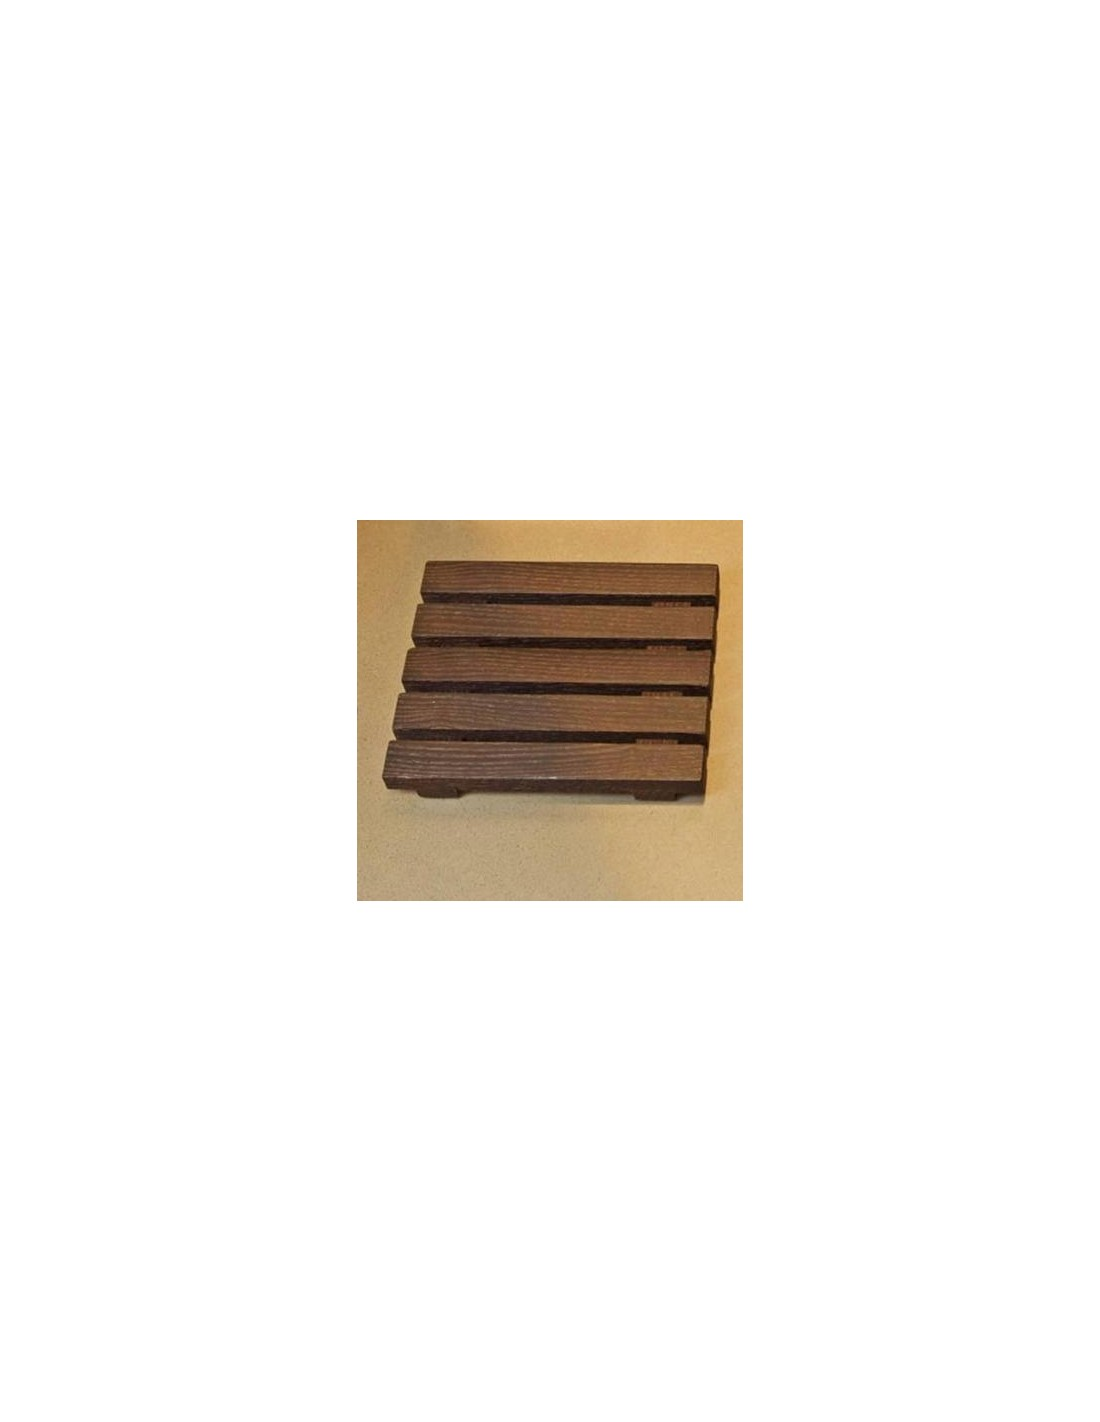 Porte savon Wood du bois naturel en frêne thermo huilé foncé  Decor Walther